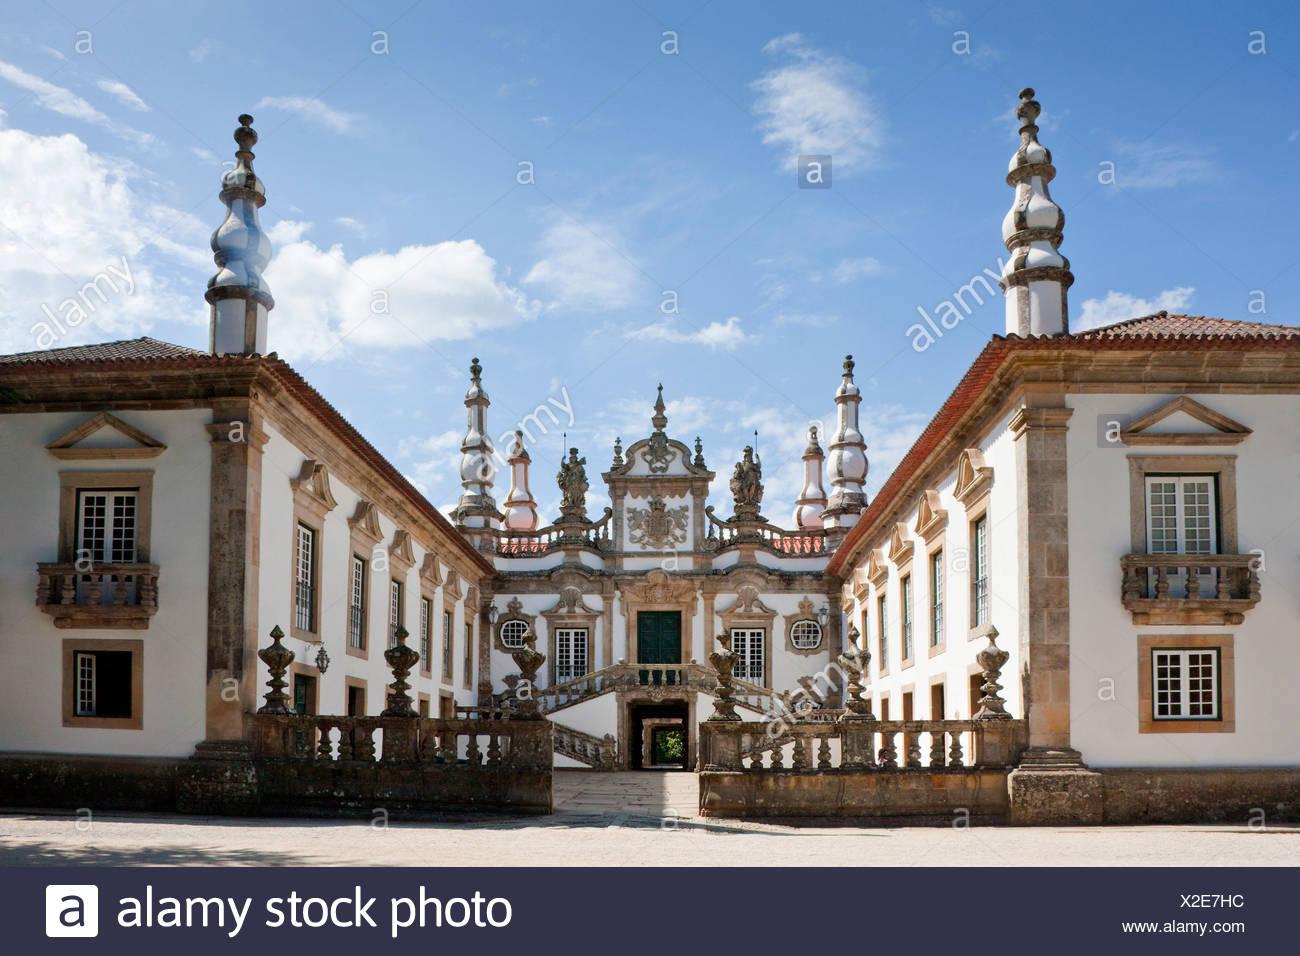 Portugal, Europe, Mateus, Vila Real, palace, culture - Stock Image